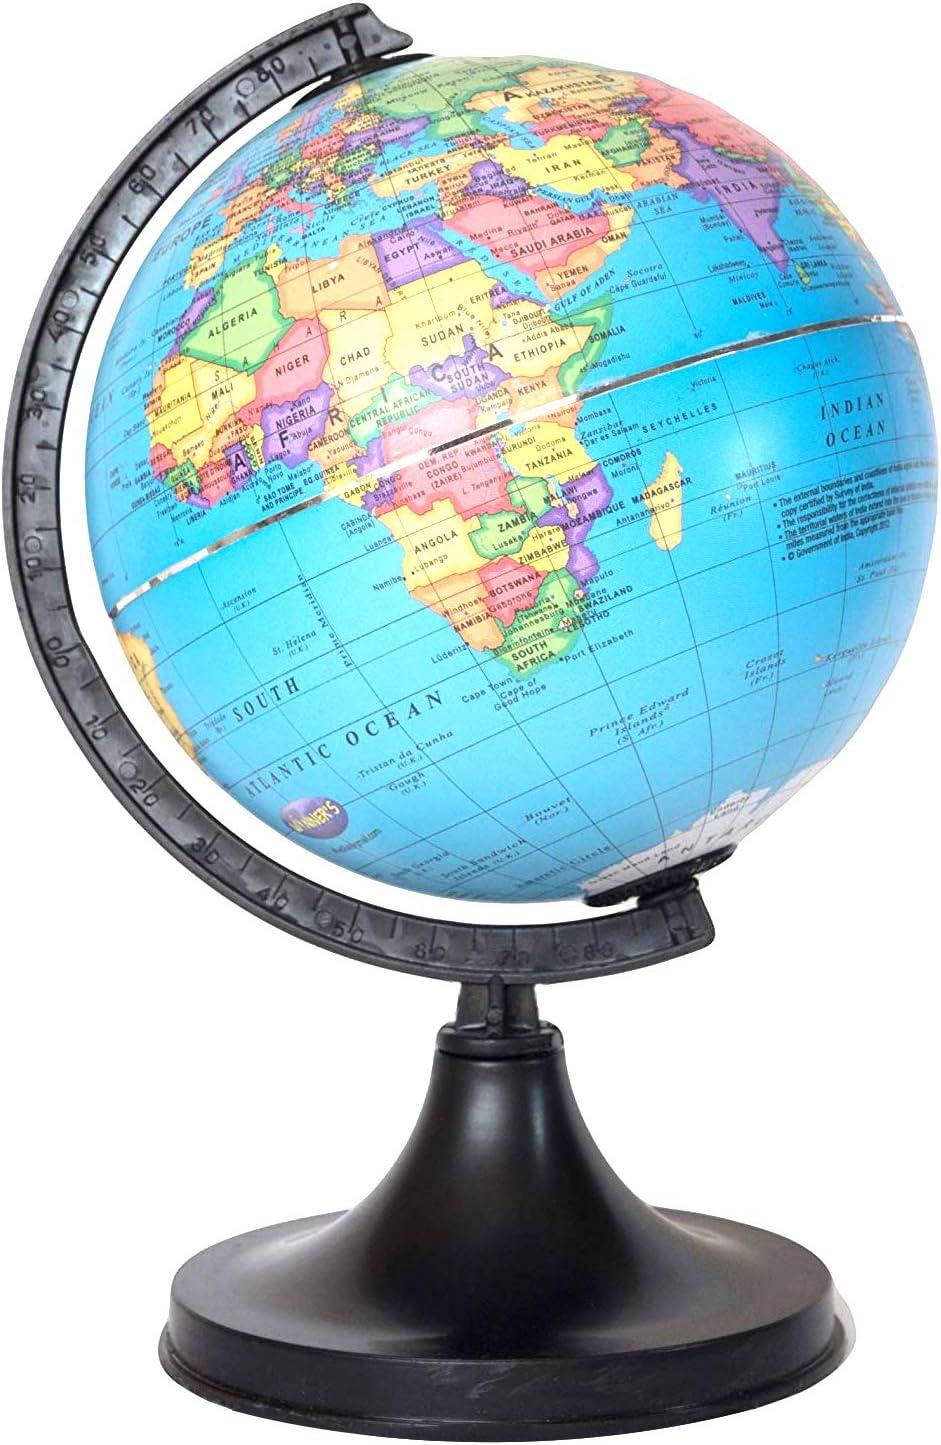 Roatating Globe For Kids//Office//School 5 inch SS Ecom Educational World Globe Educational Toy Desktop Decor